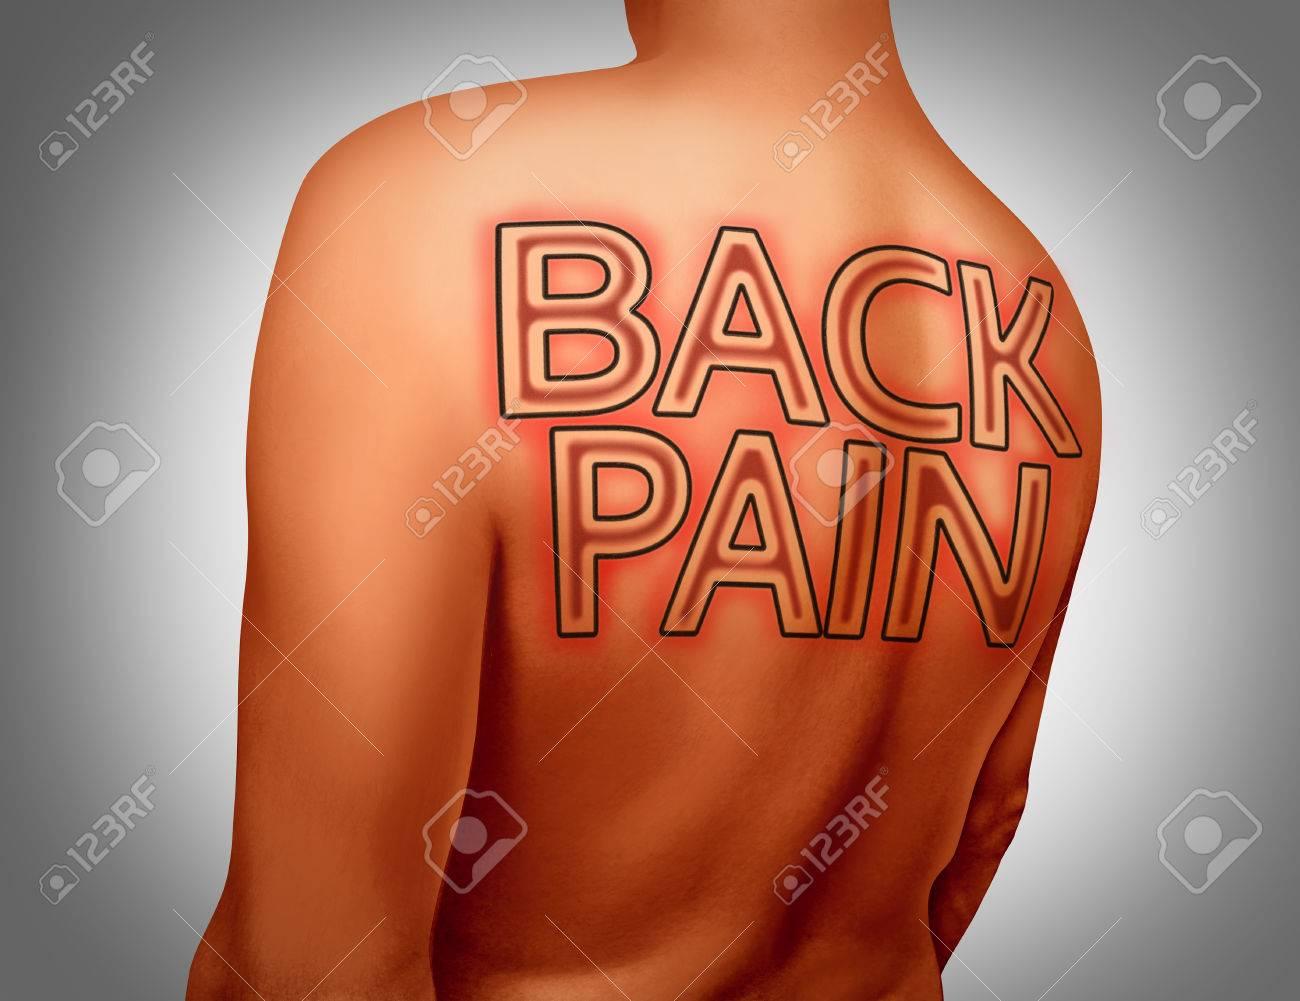 http://n3.datasn.io/data/api/v1/n3zm/image_of_skin_disease_5/by_table/skin_disease_image_download_access/6c/a1/05/af/6ca105afa5f010e15ac97913218b46b8baf23bd1.jpg